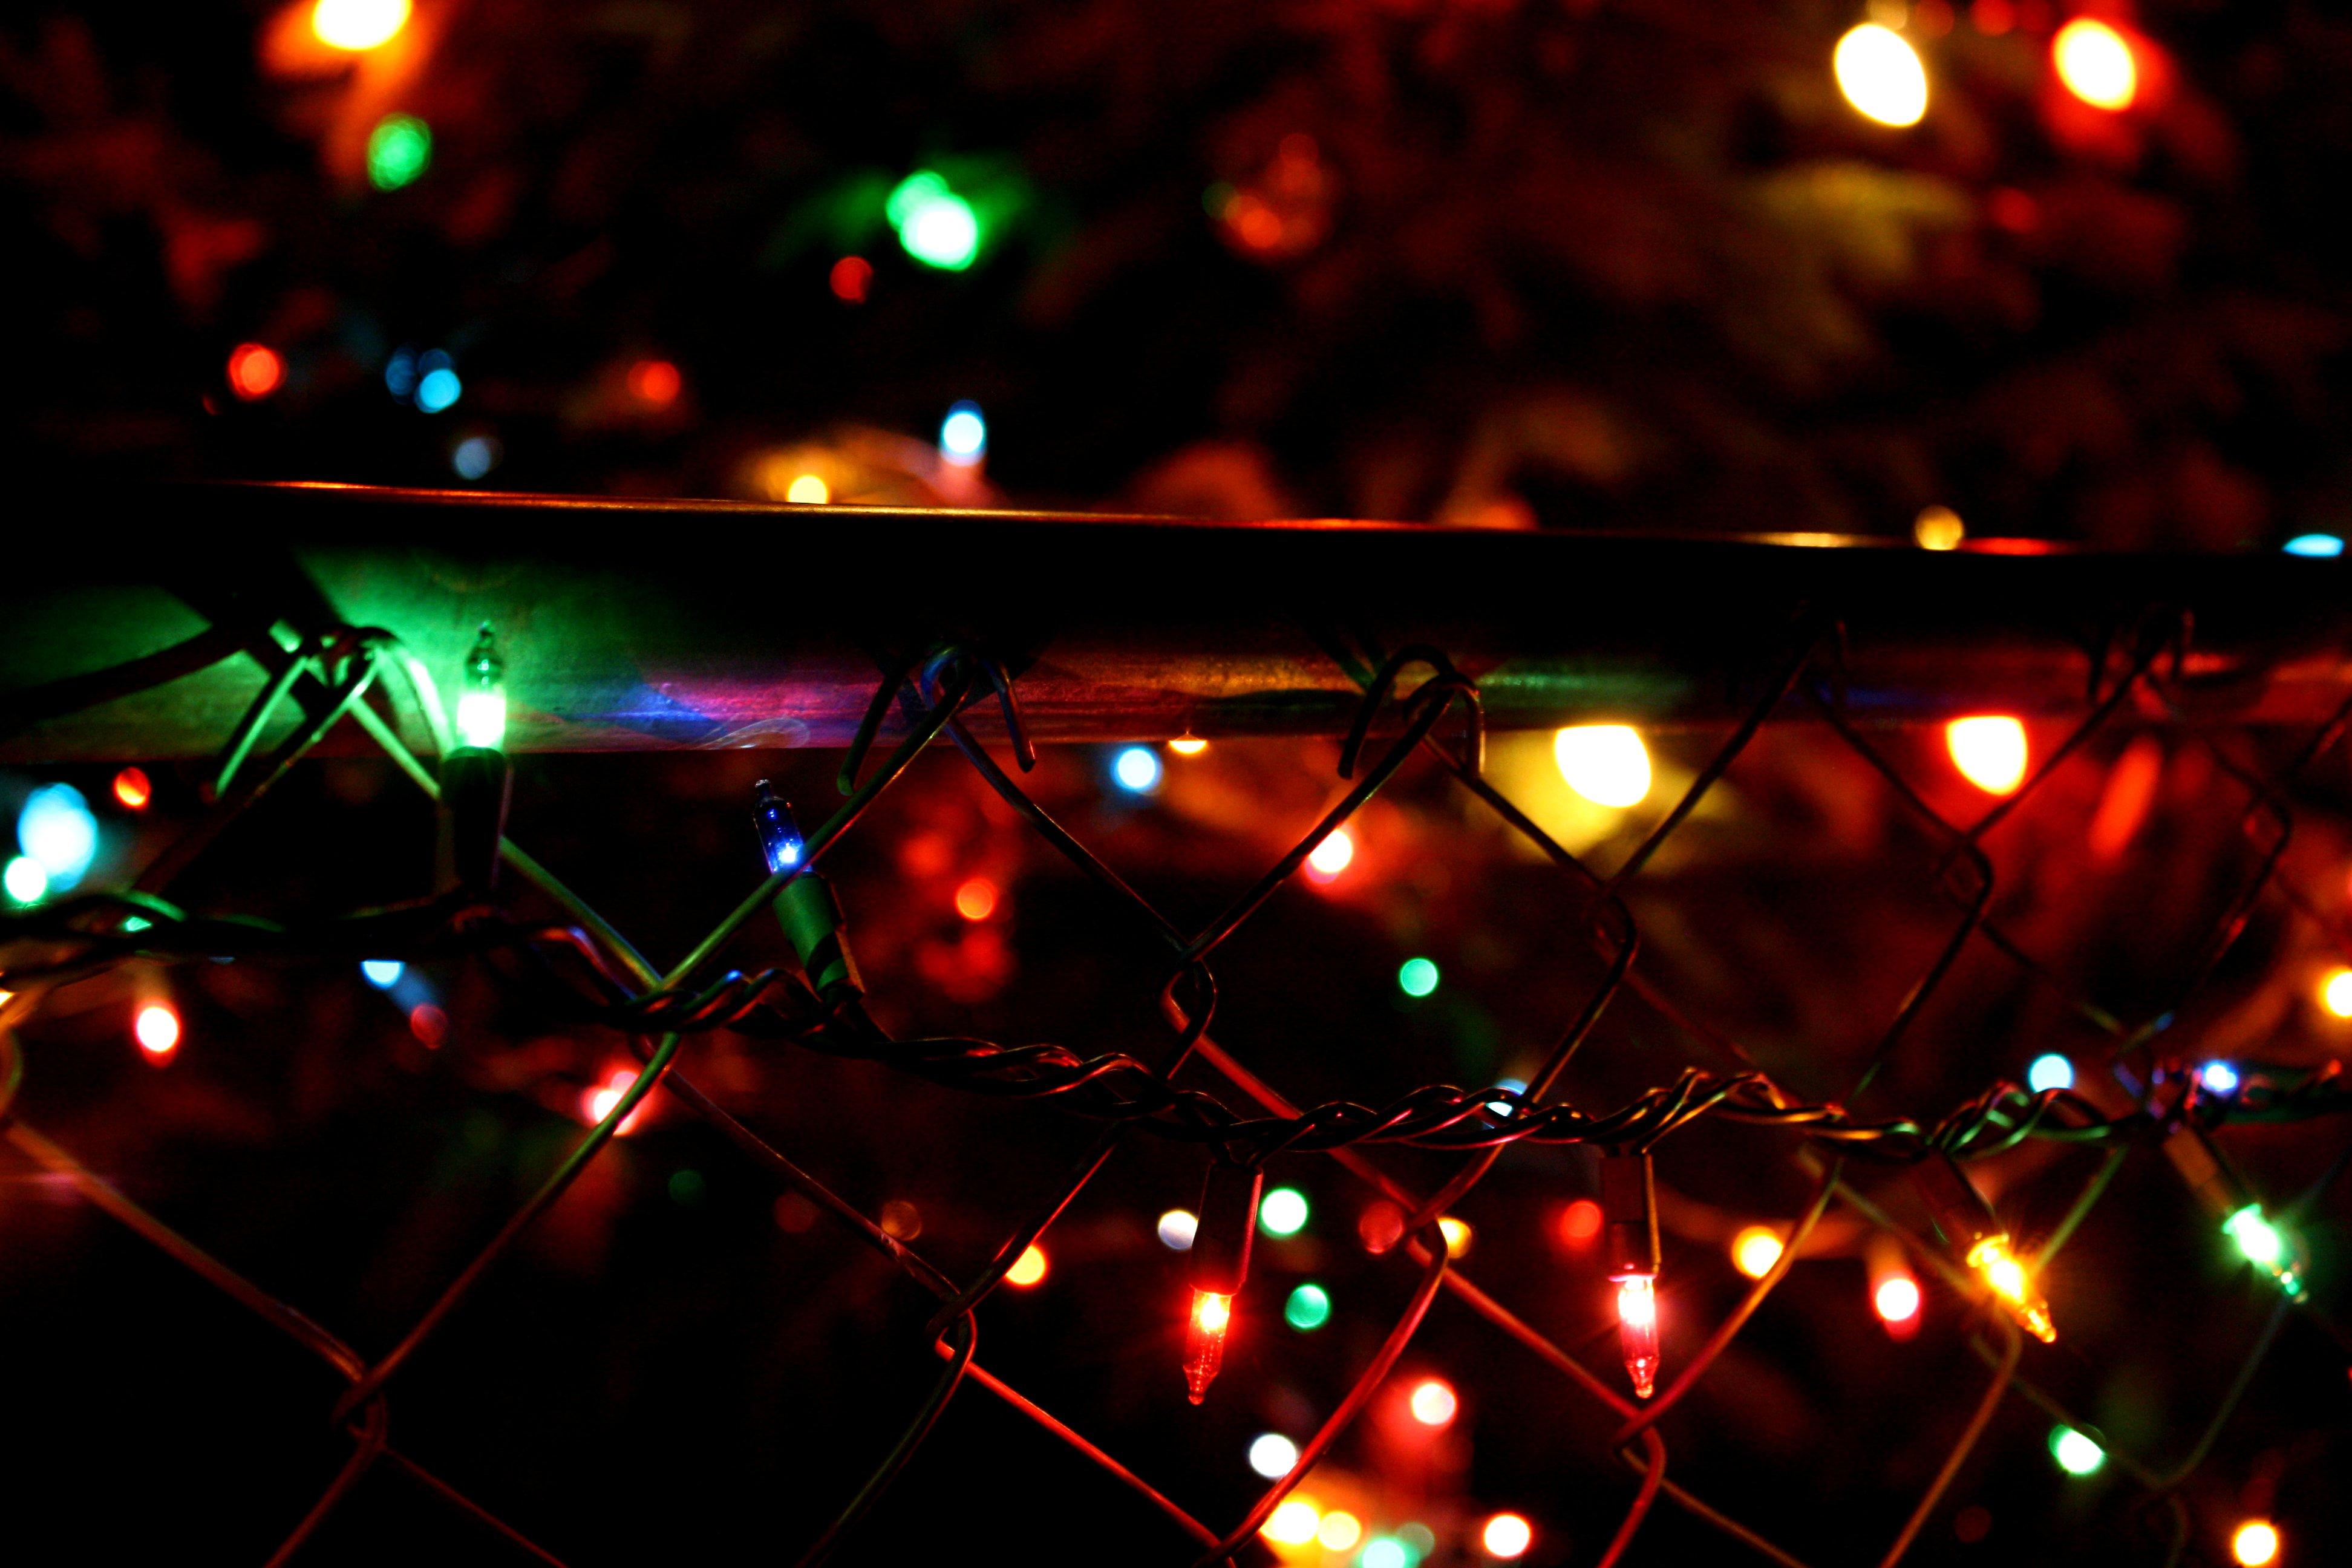 Sfondi : Bokeh, Recinto, Luci Di Natale 3888x2592